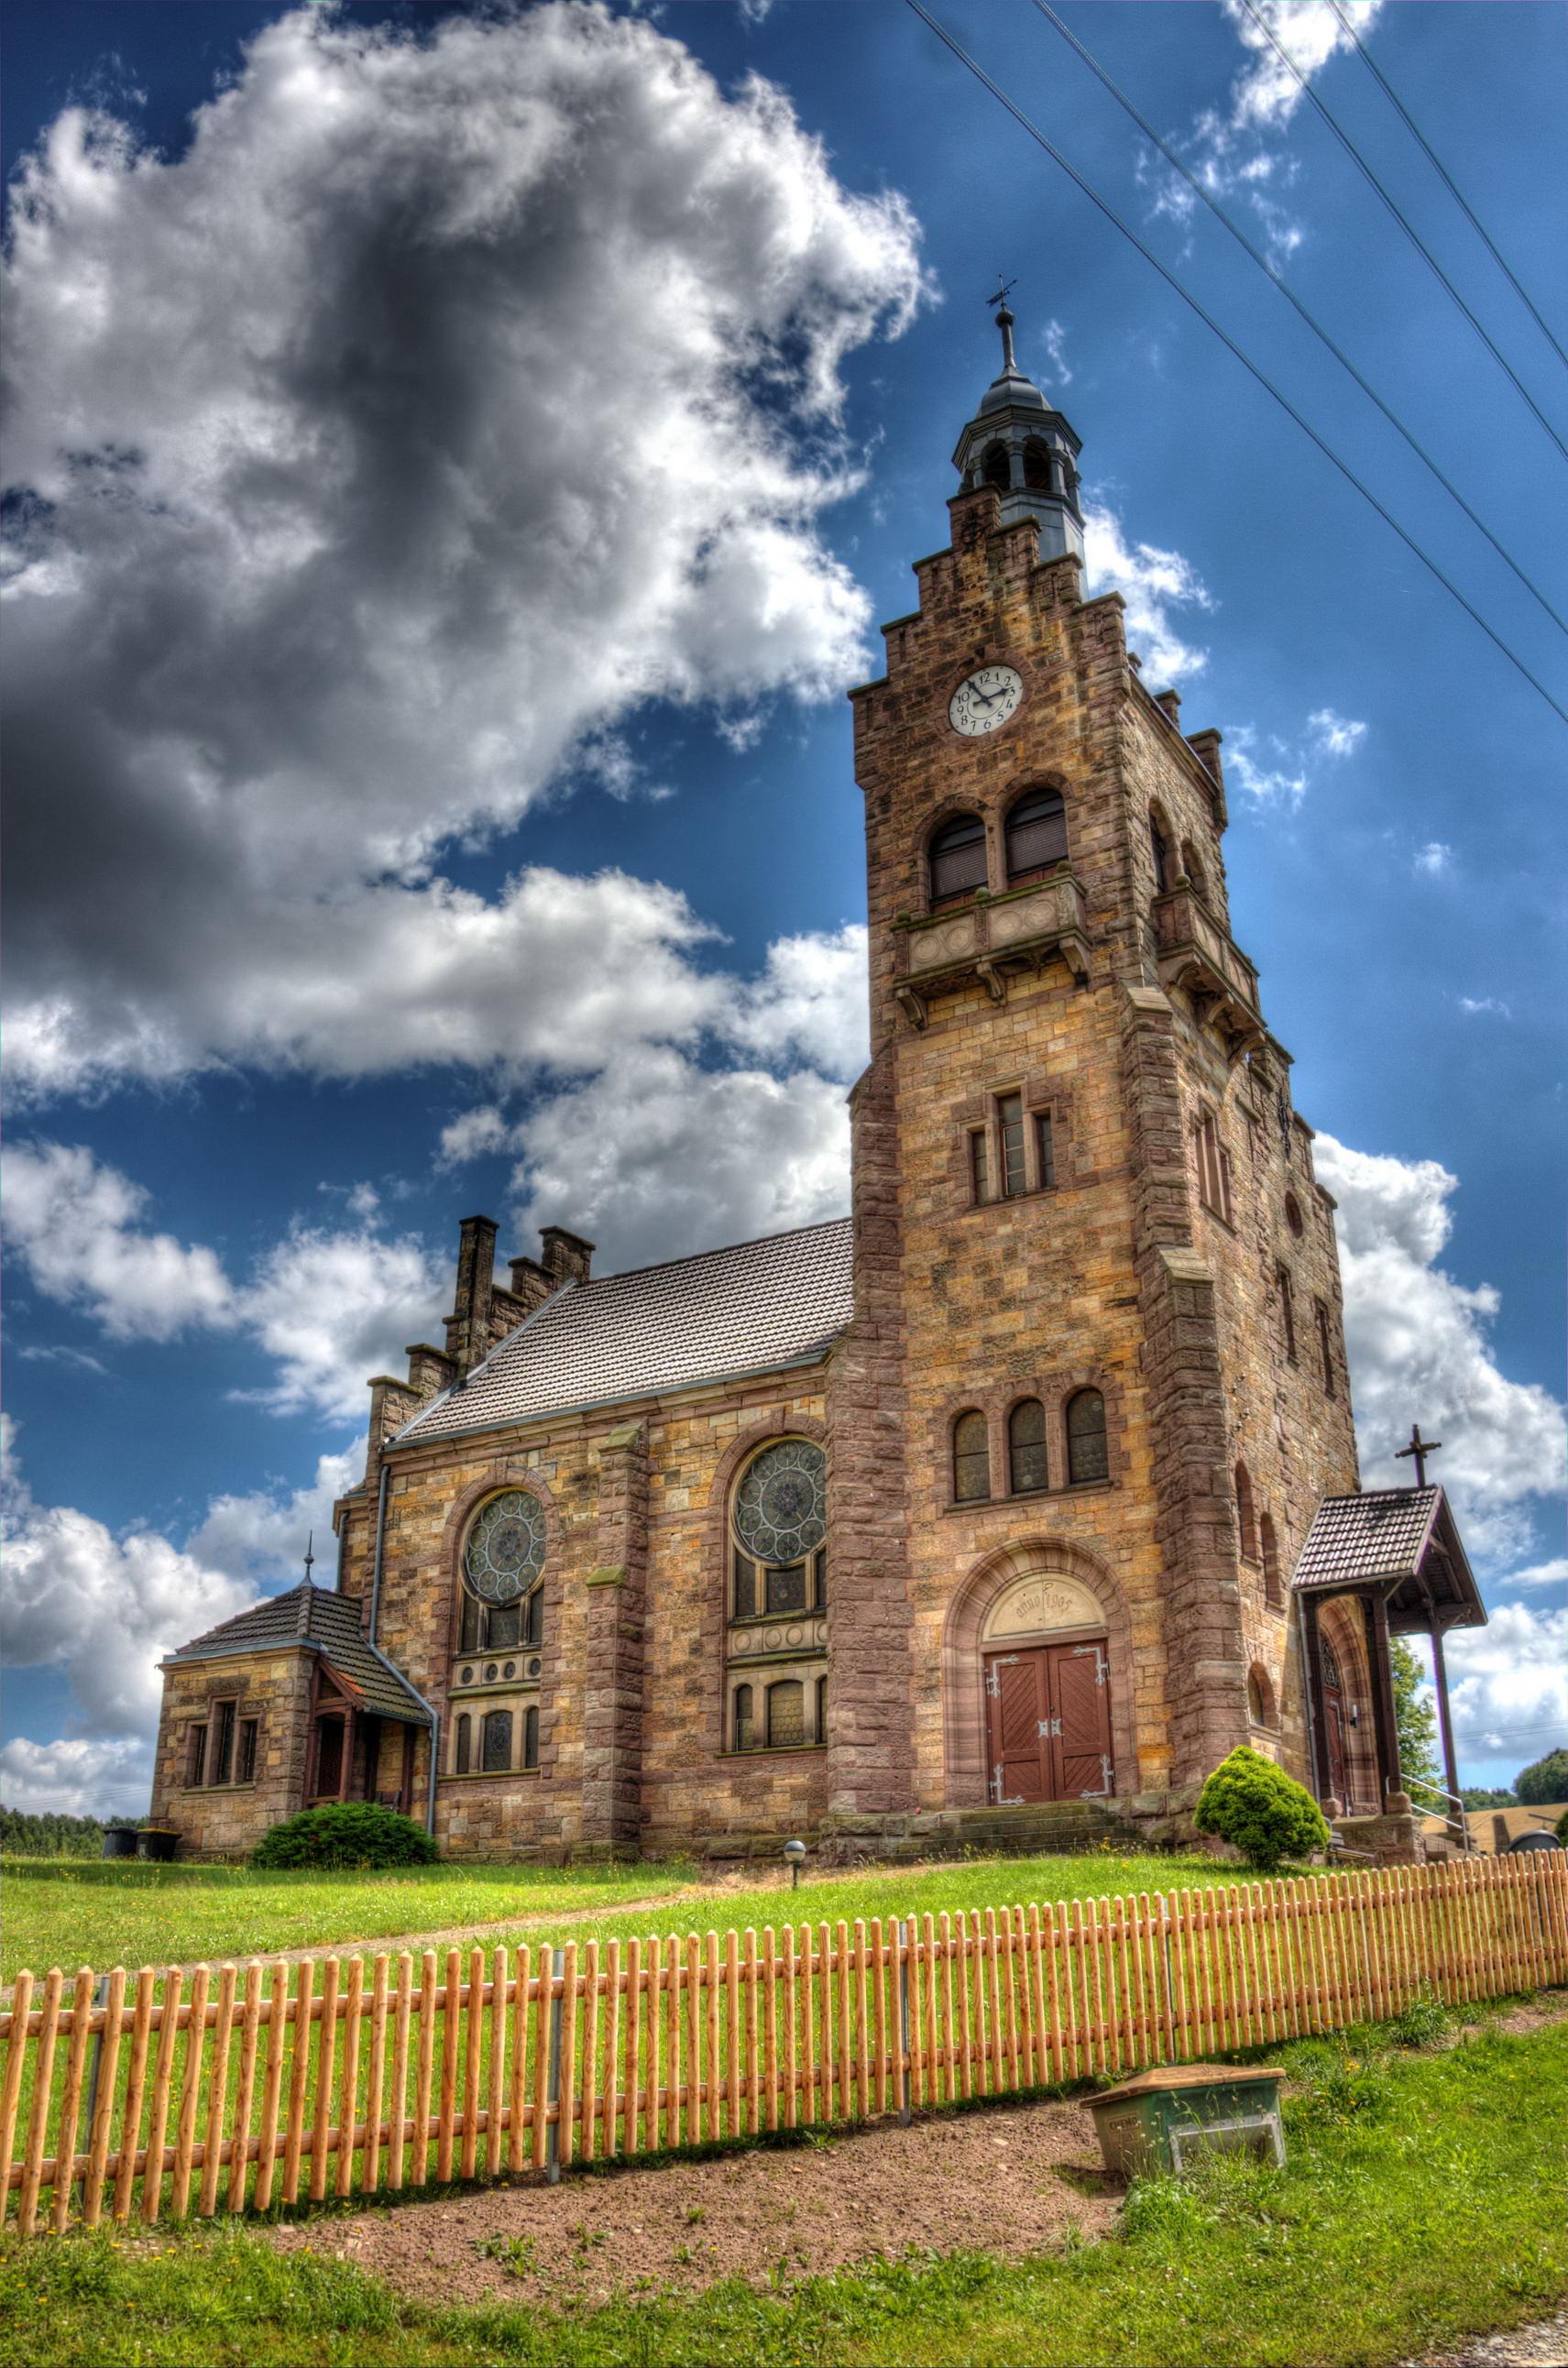 Bild von Kirche